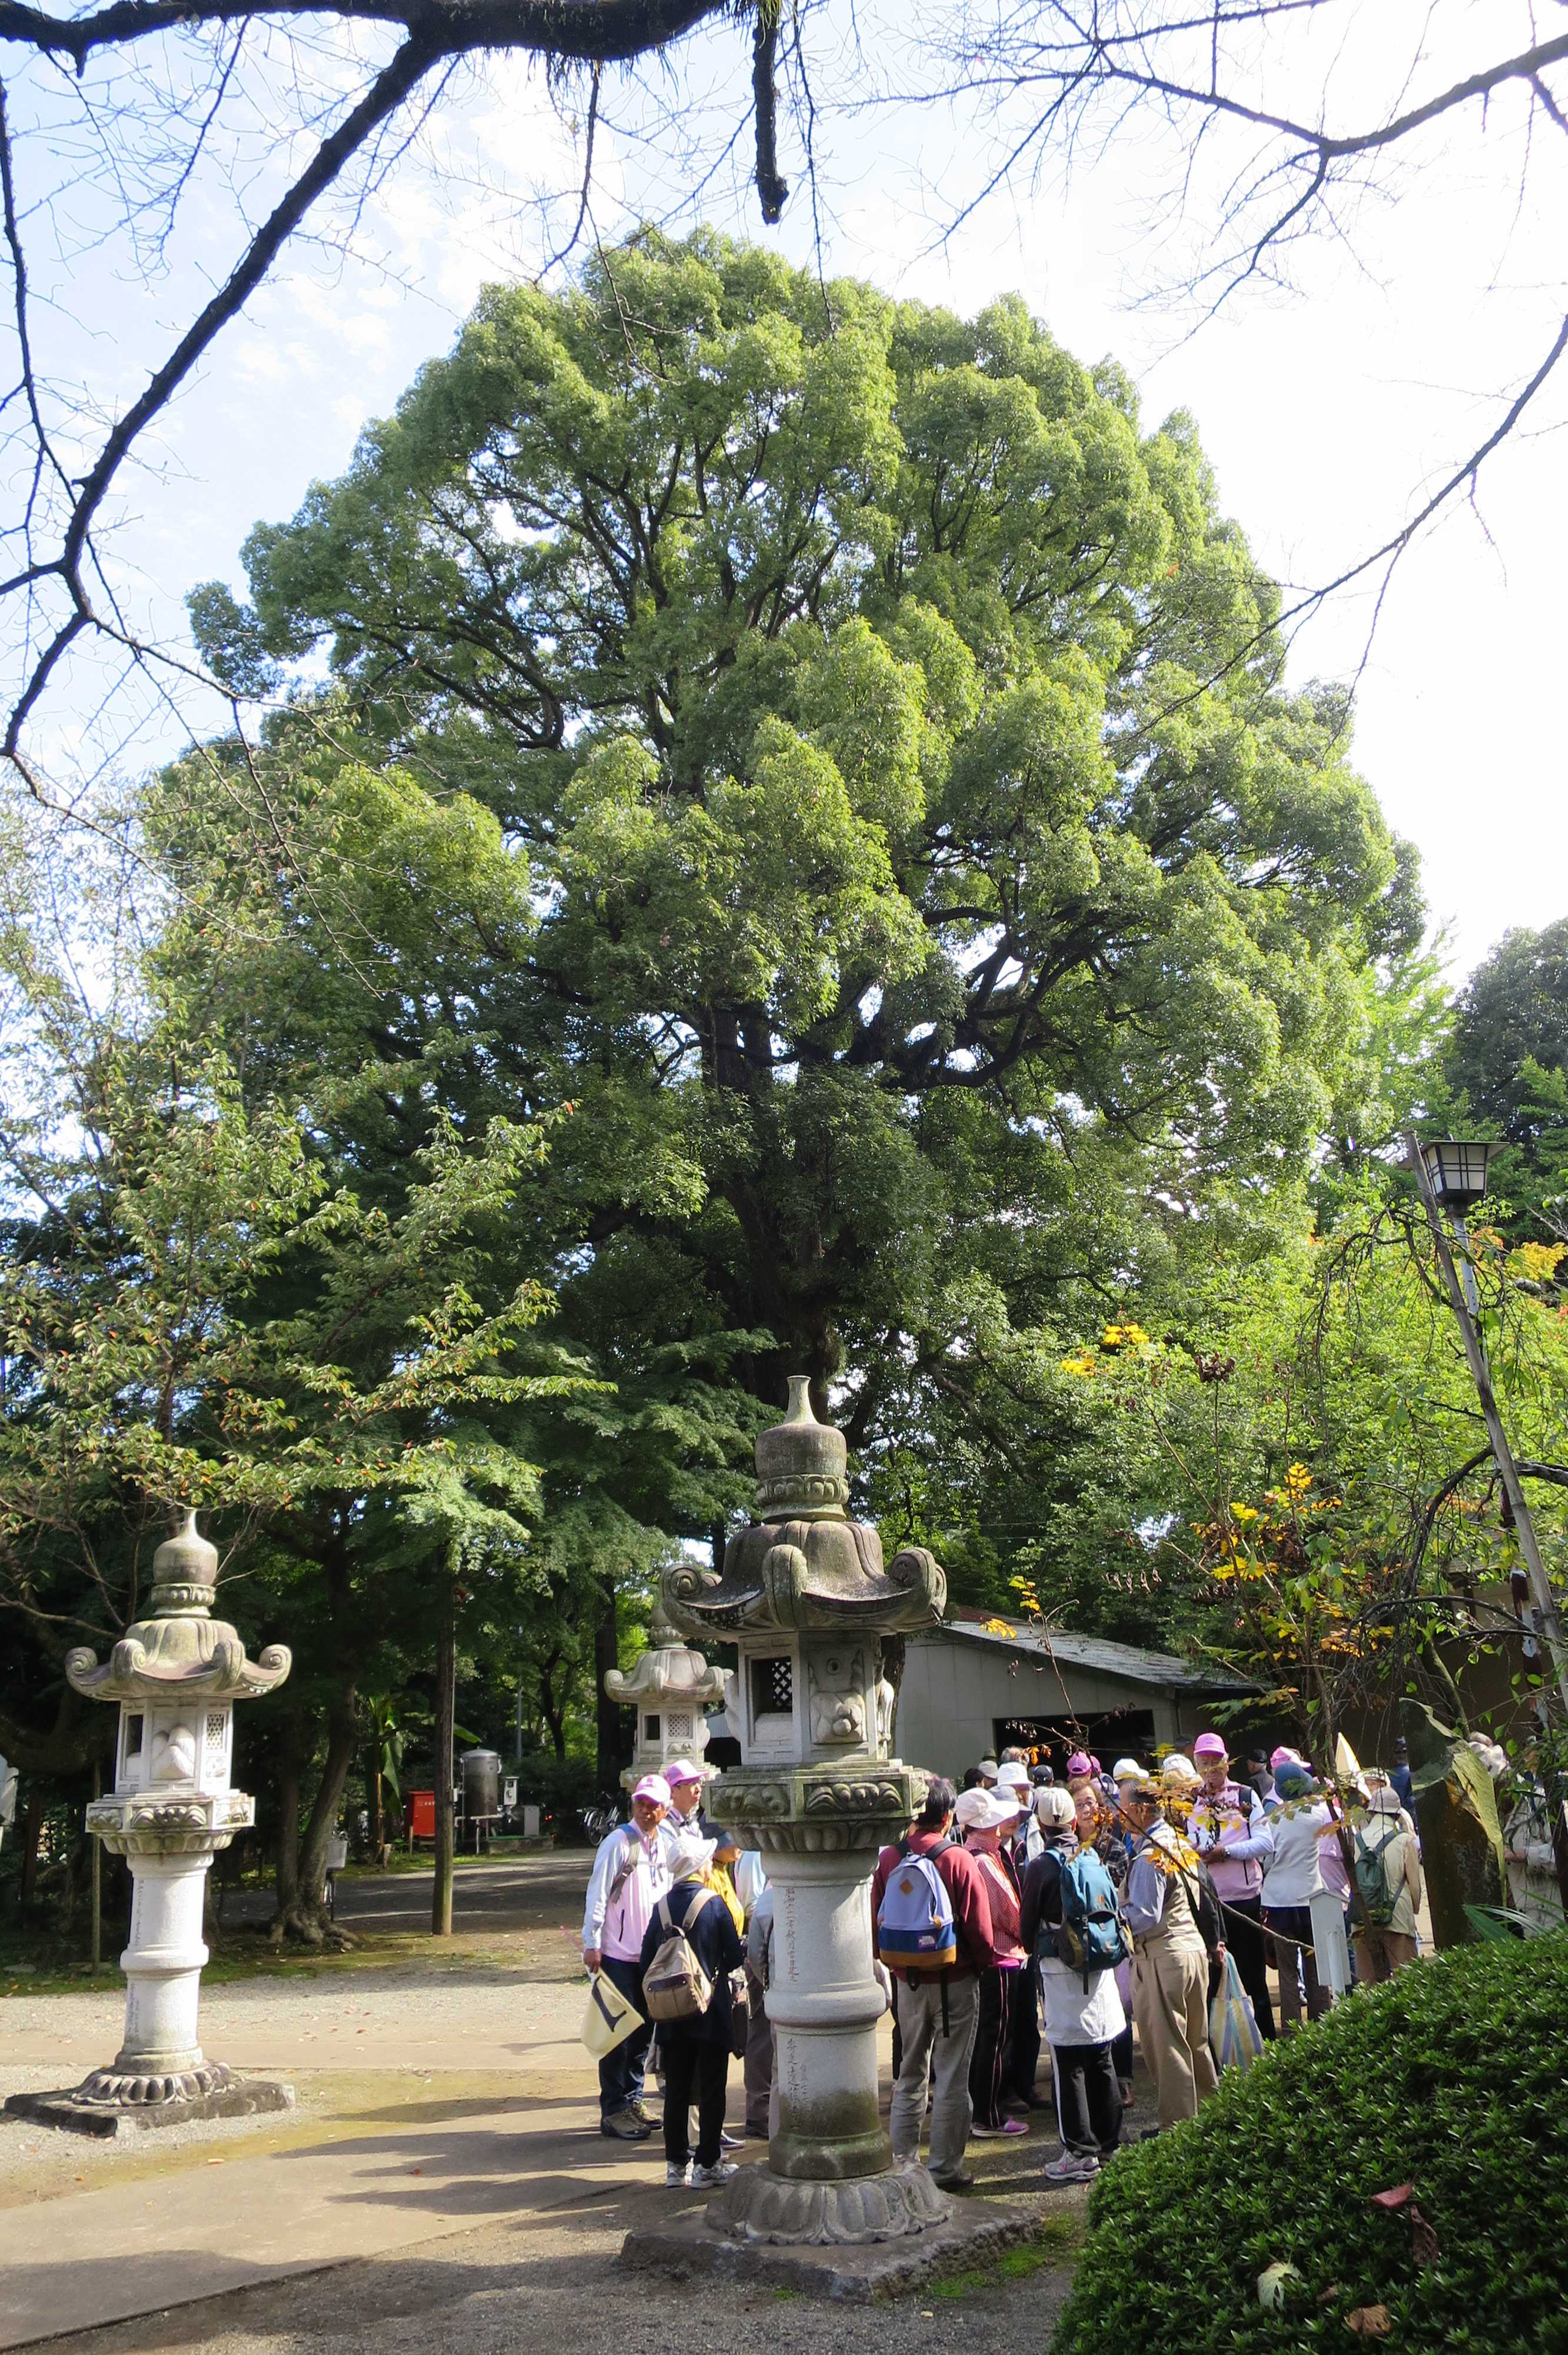 無量光寺 - 境内の大樹